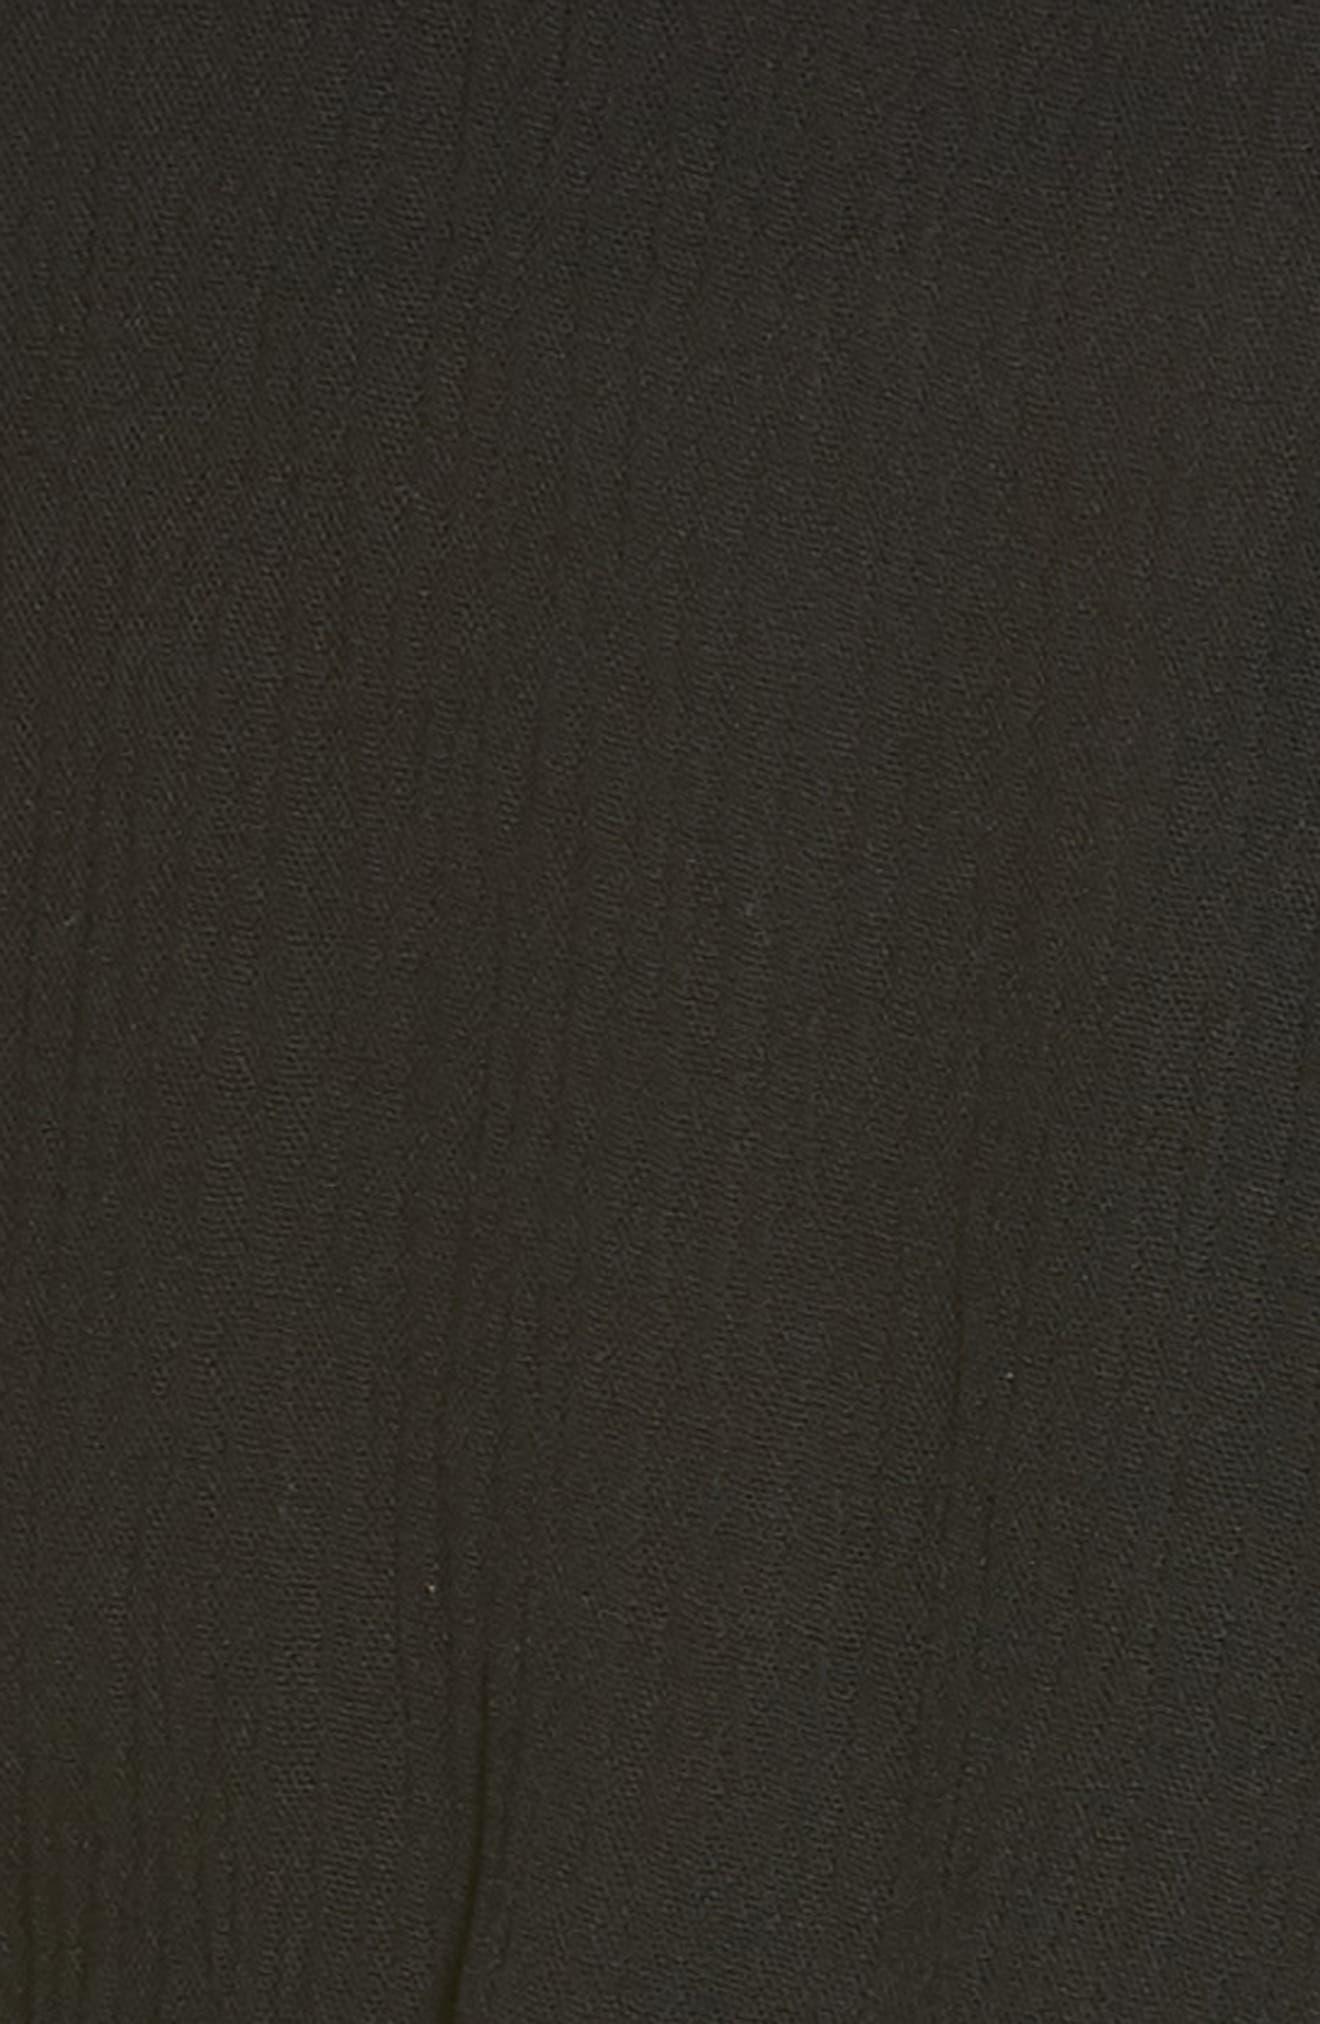 ELAN, Ruffle Sleeve Cover-Up Romper, Alternate thumbnail 6, color, BLACK